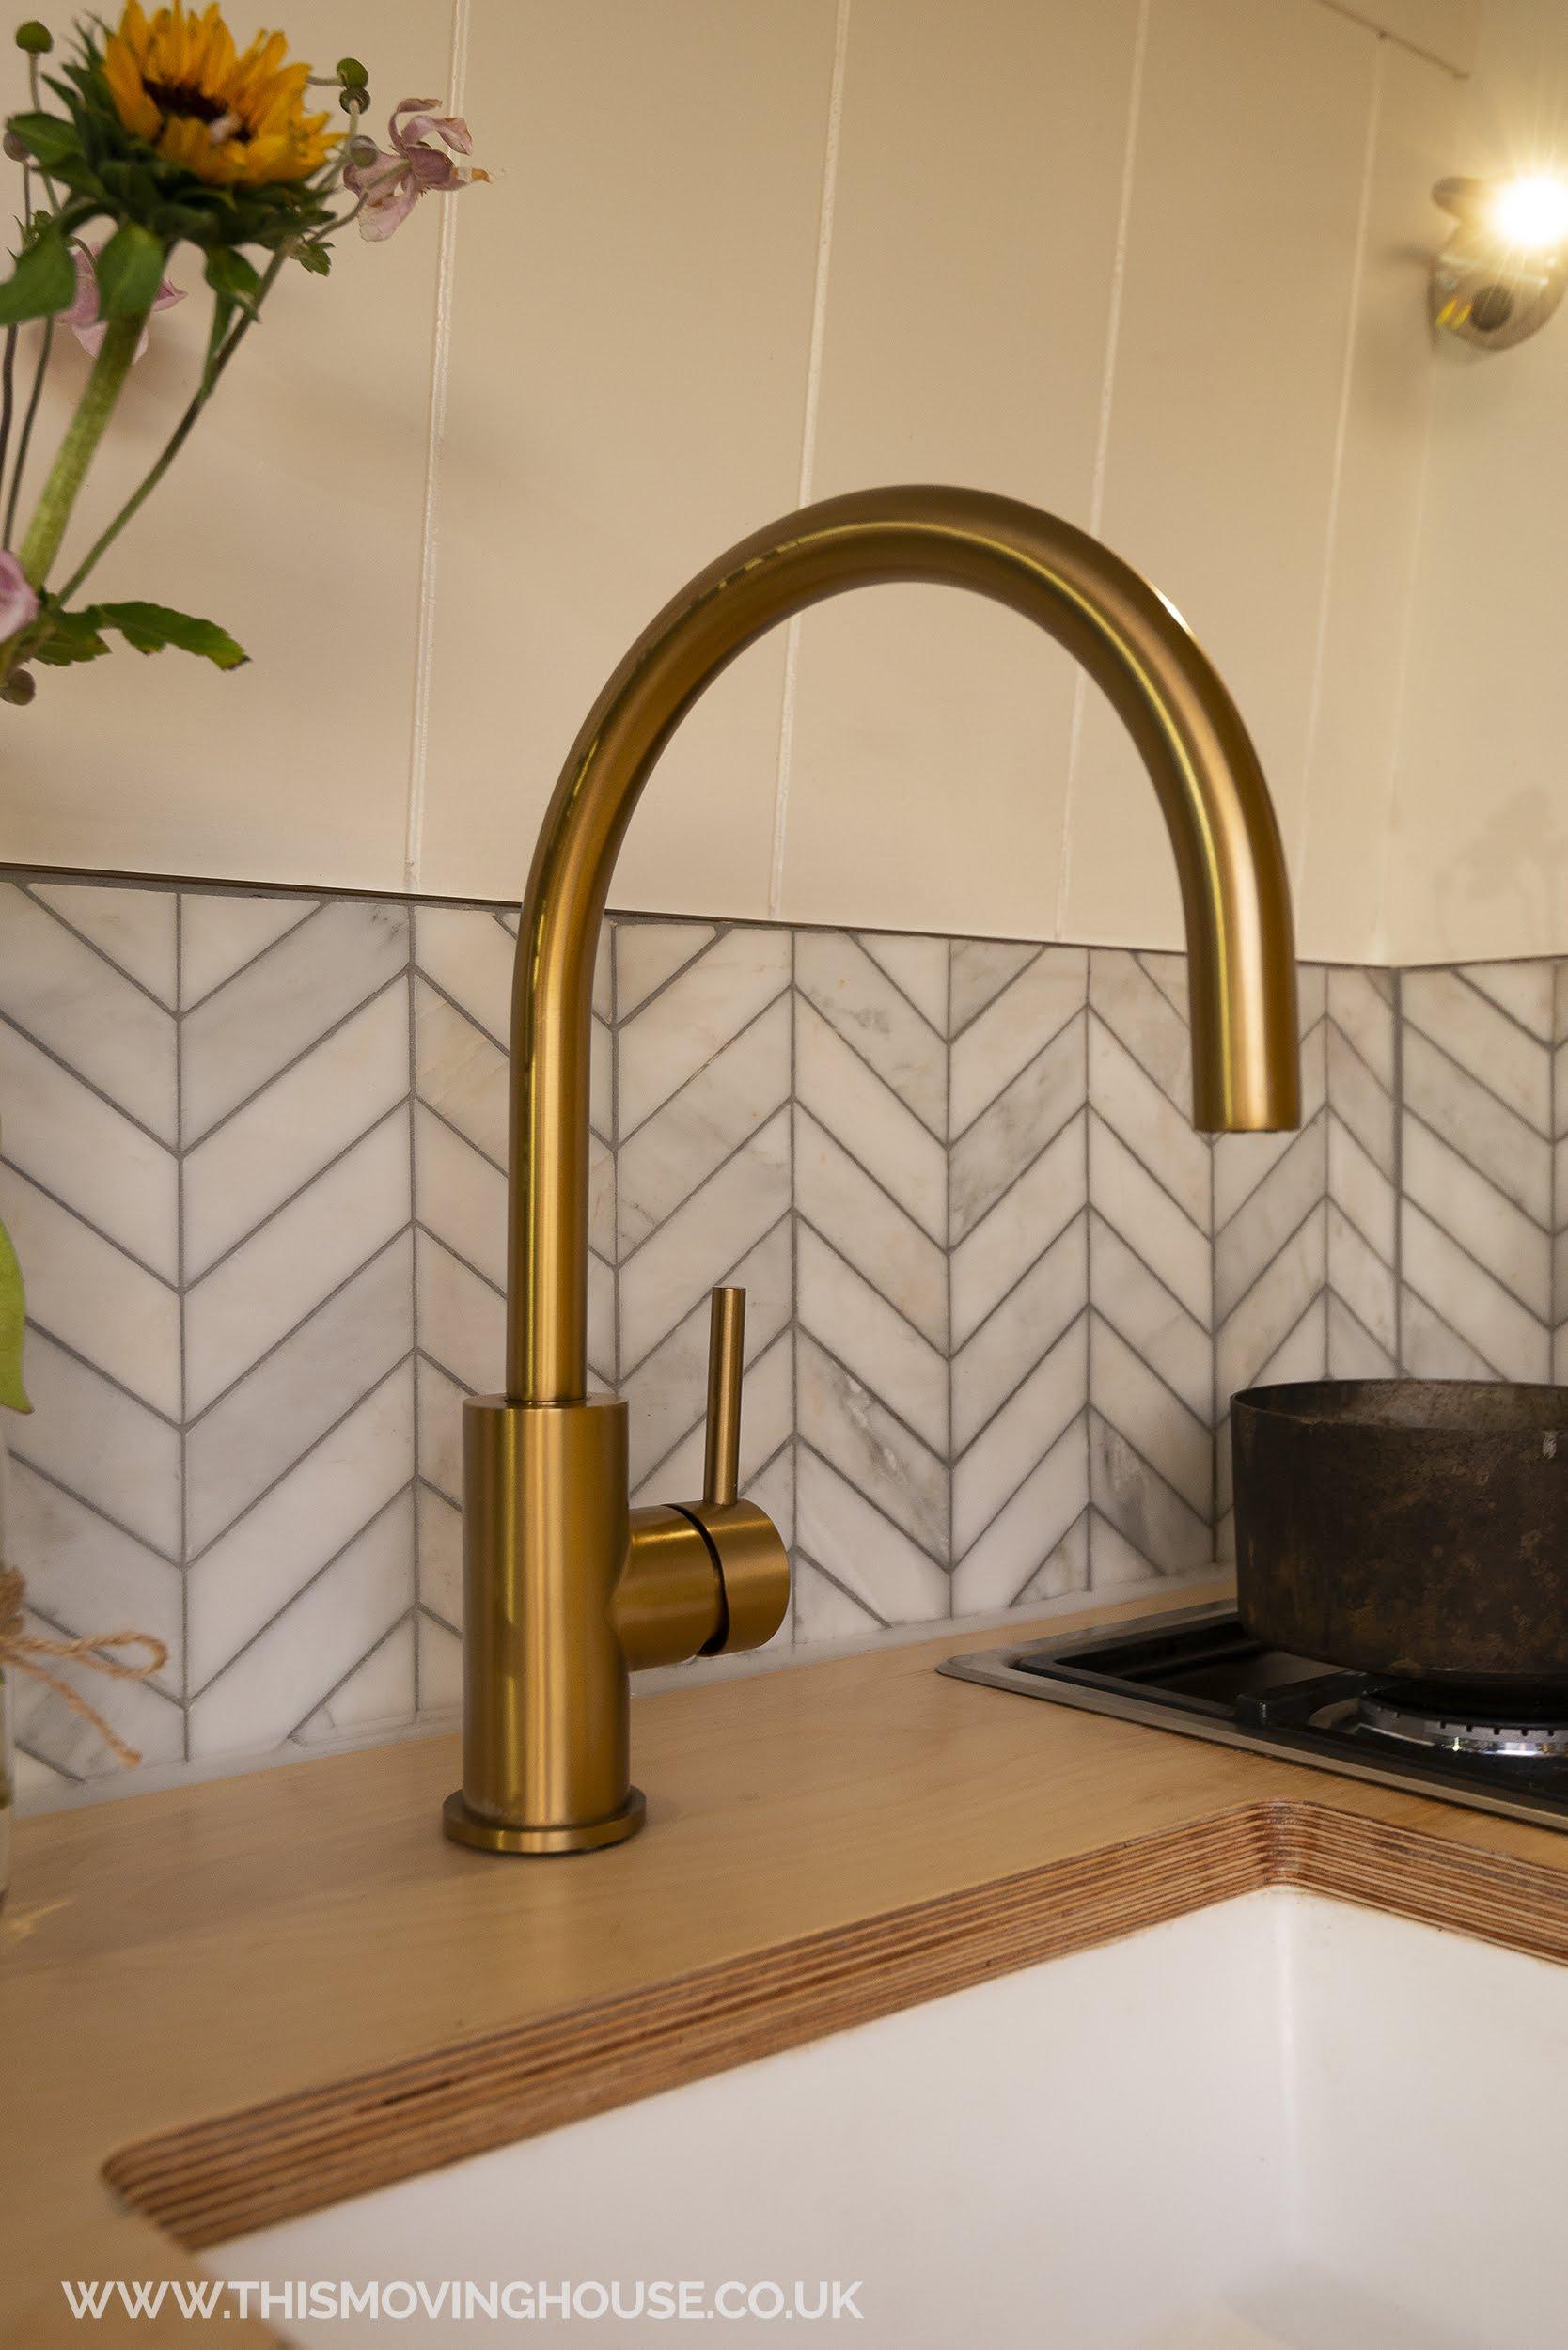 Gold tap in a camper van kitchen